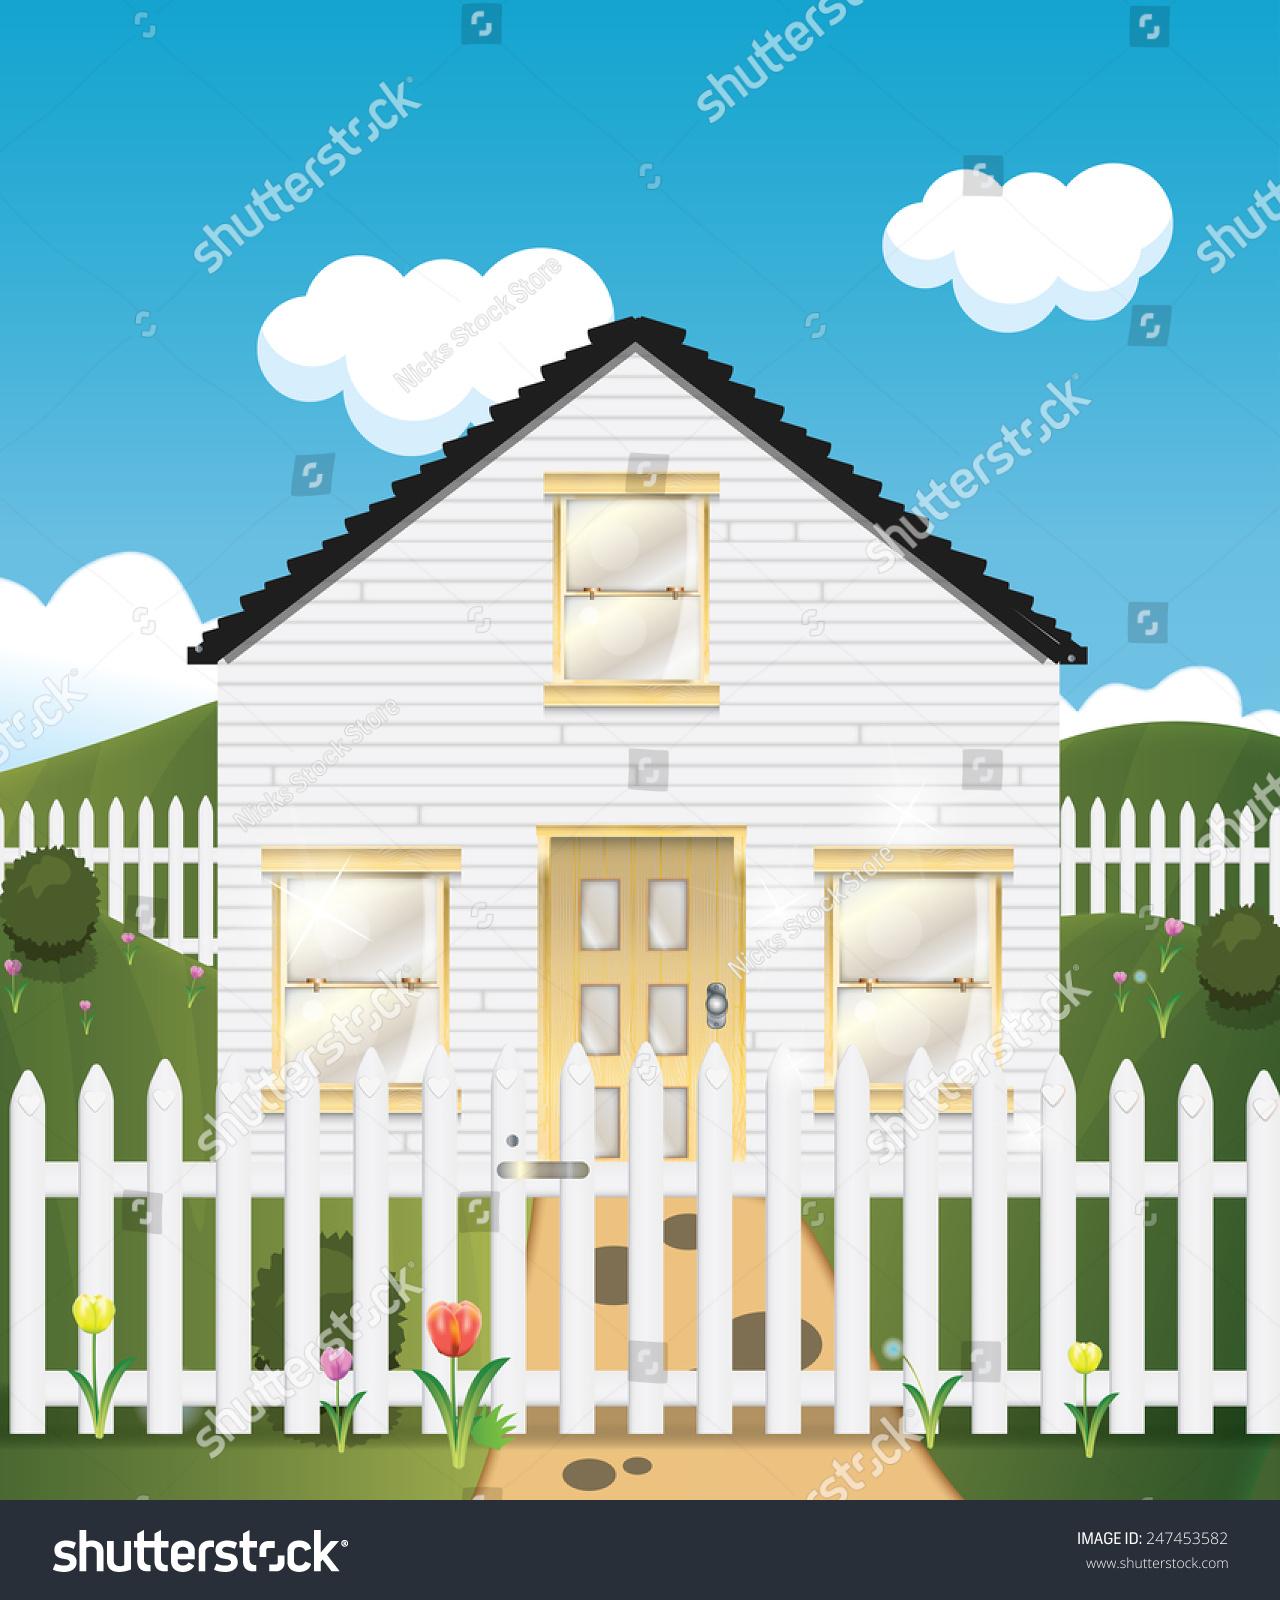 wooden house picket fence stock illustration shutterstock